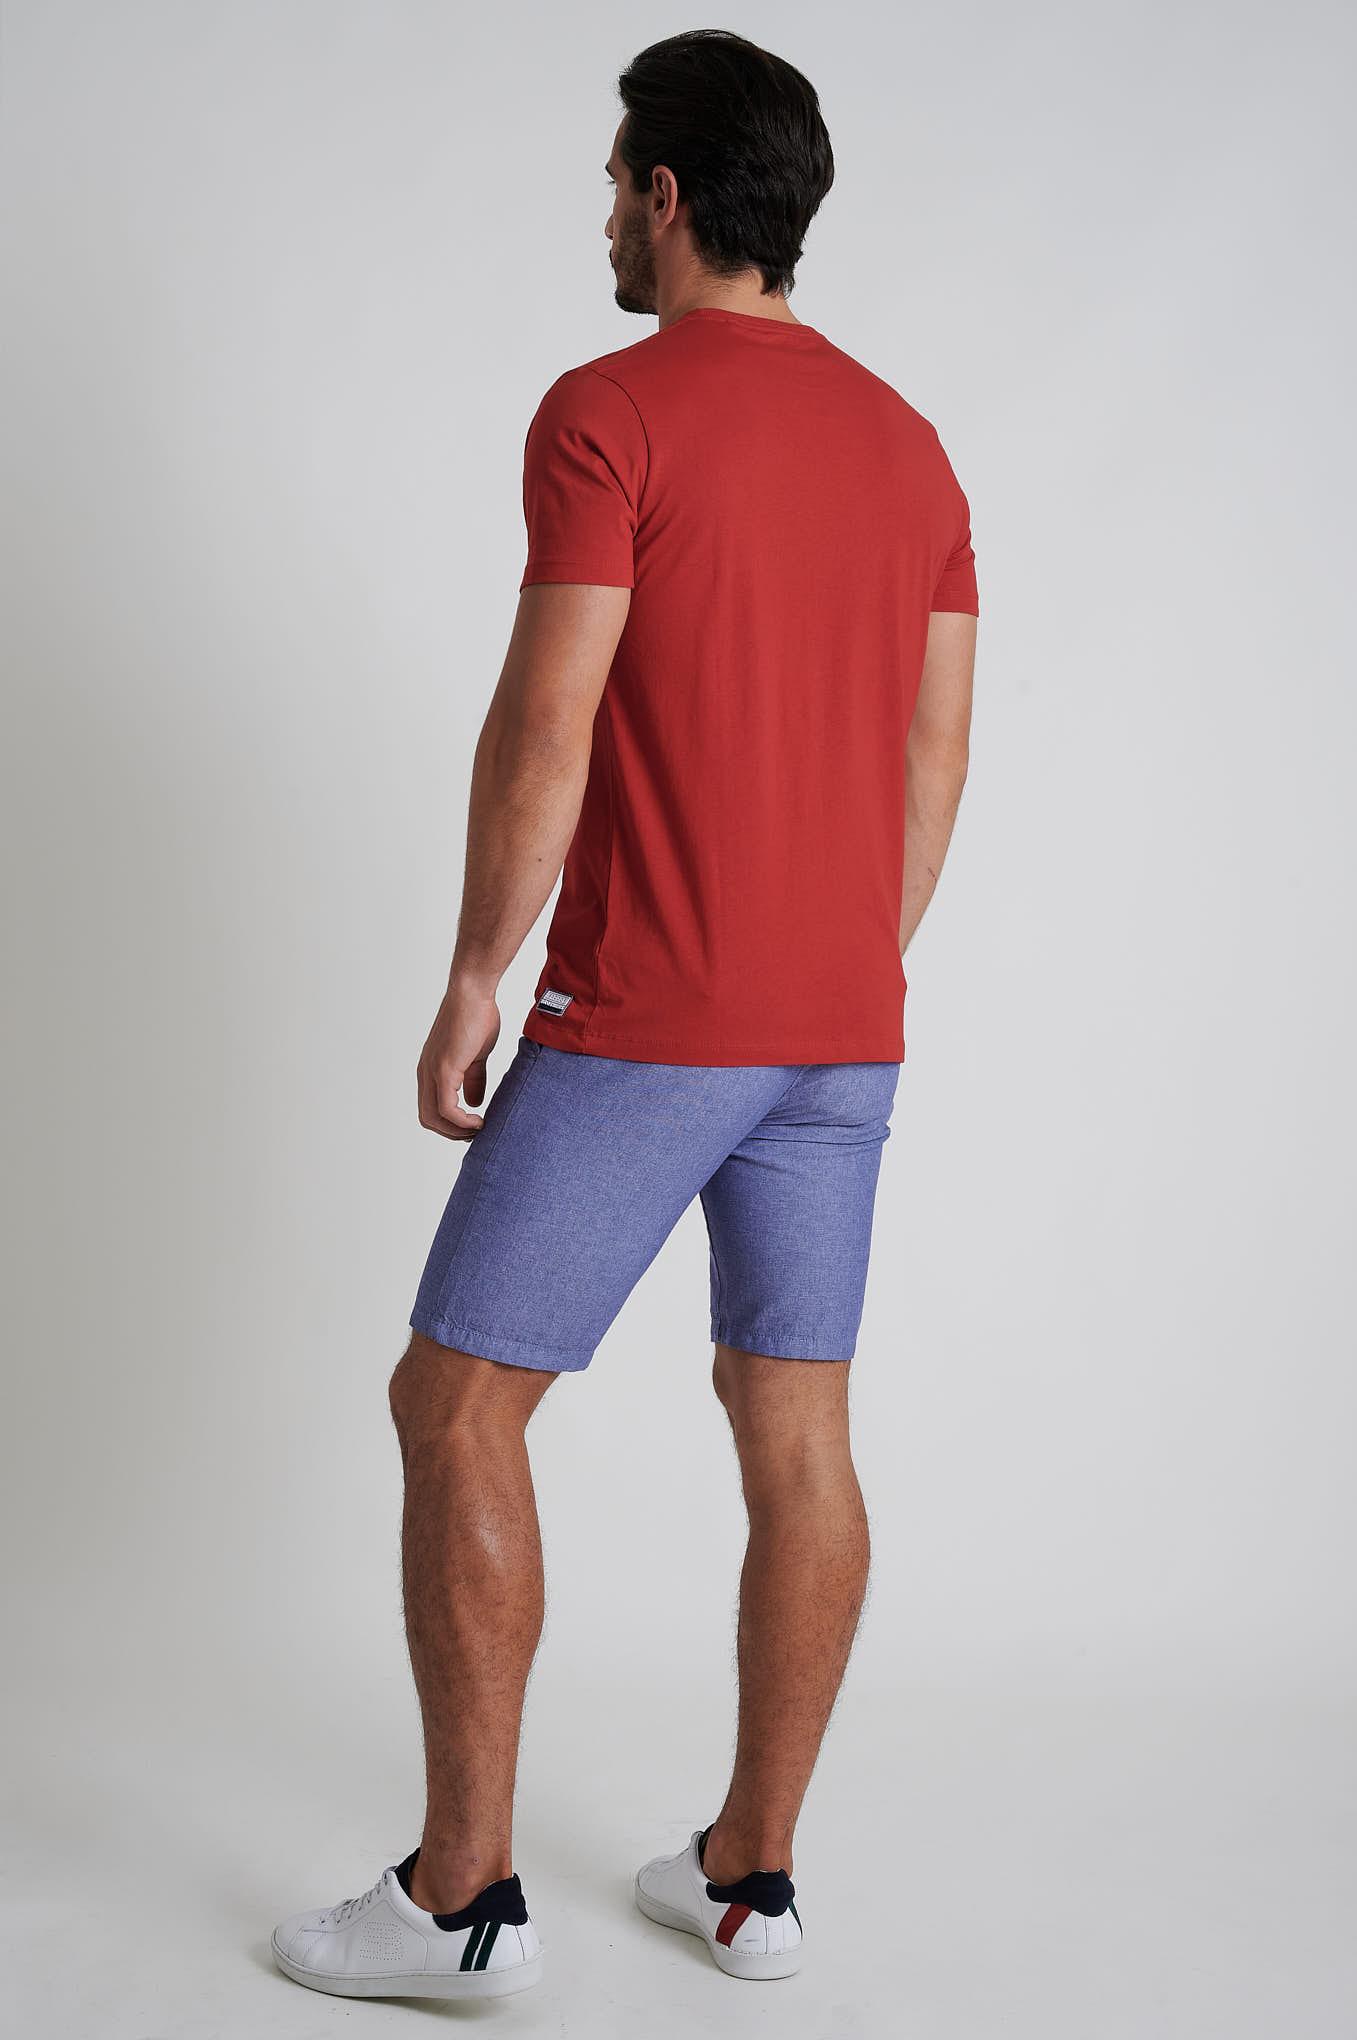 T-Shirt Vermelho Sport Homem